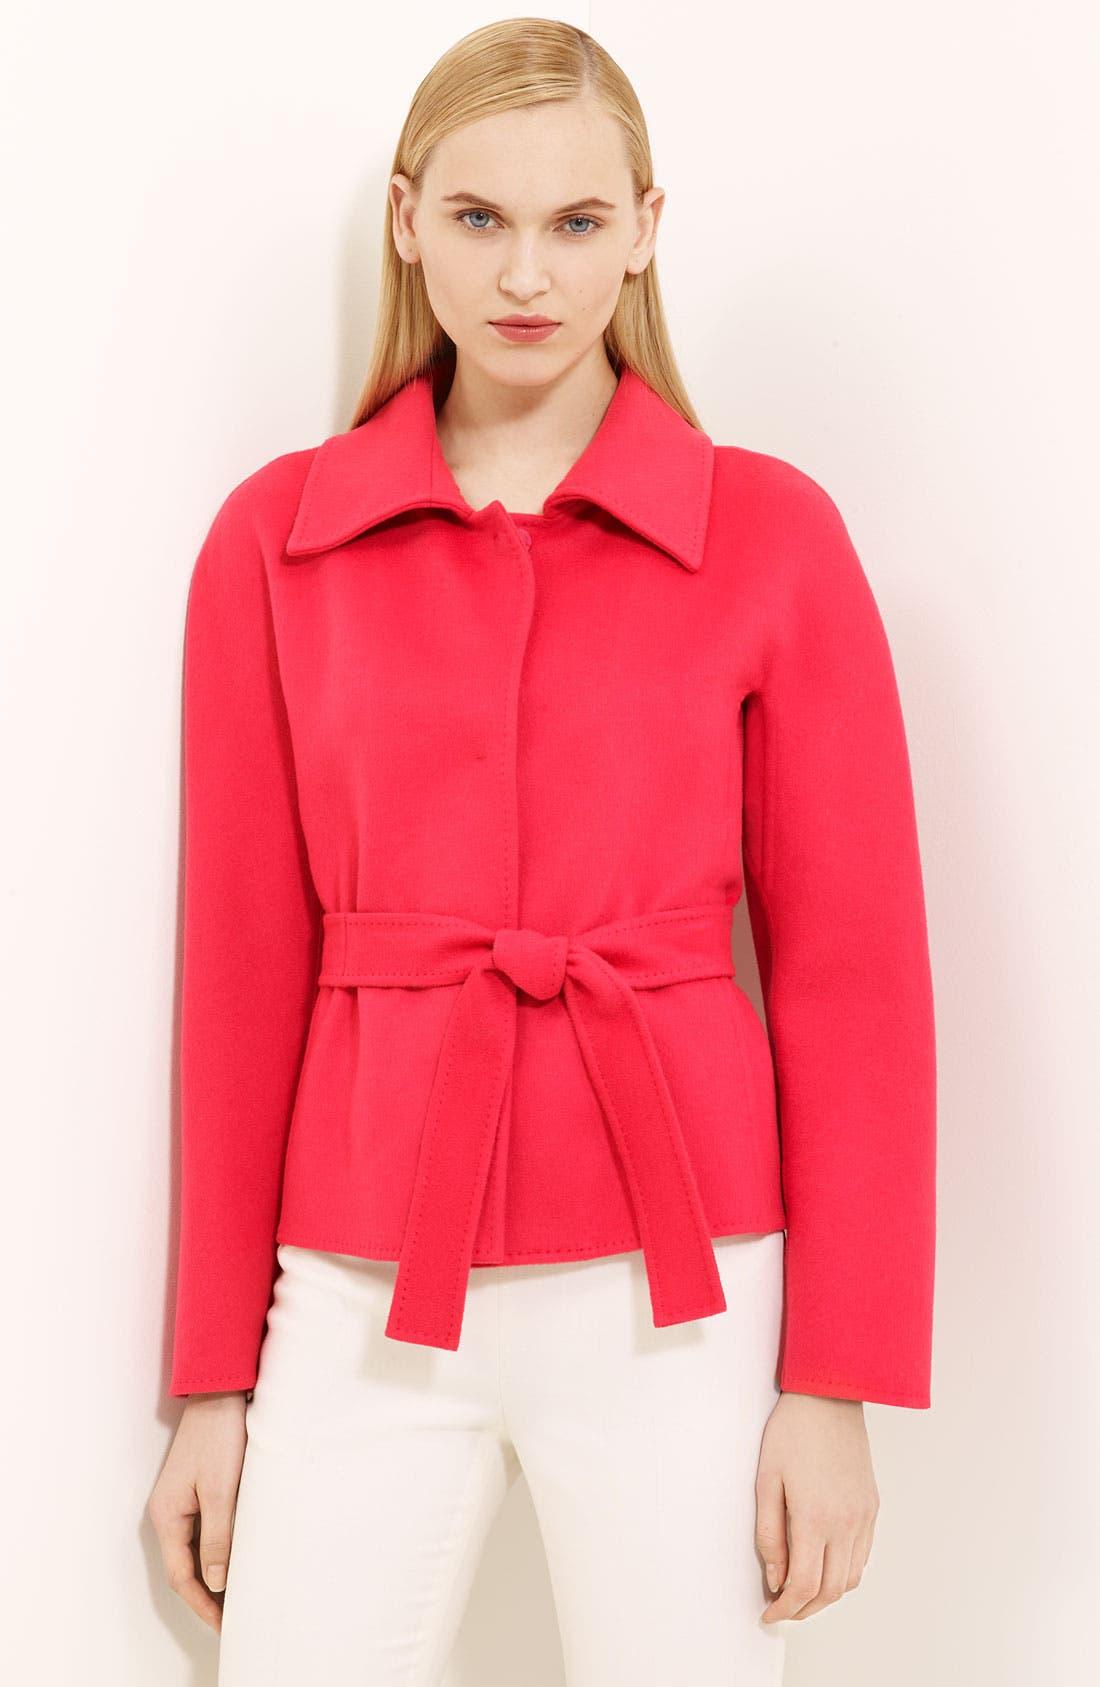 Alternate Image 1 Selected - Max Mara 'Sandra' Belted Jacket